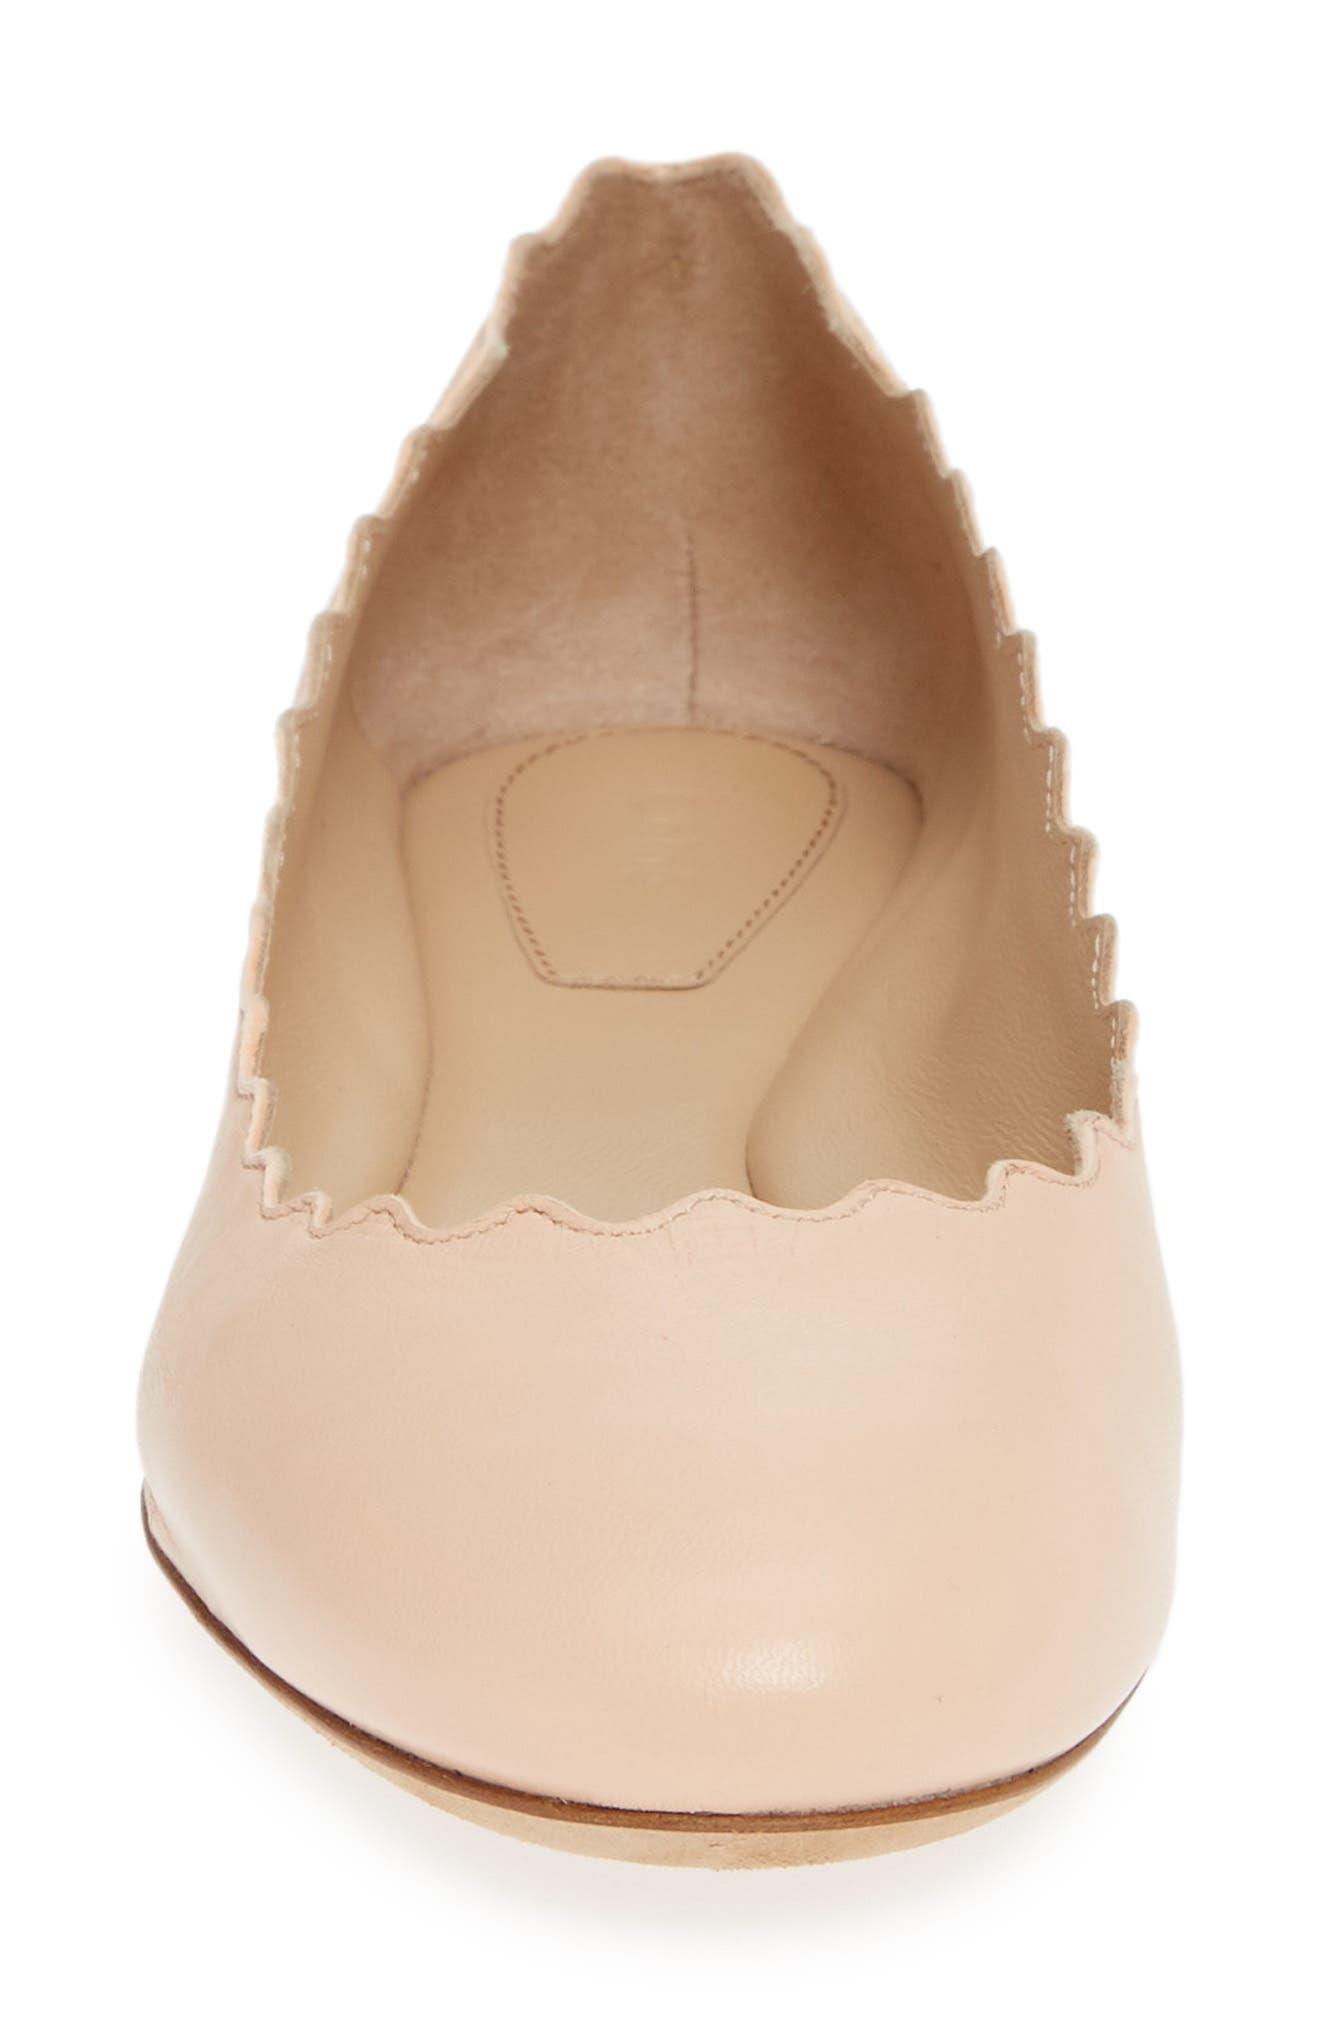 'Lauren' Scalloped Ballet Flat,                             Alternate thumbnail 4, color,                             DELICATE PINK LEATHER